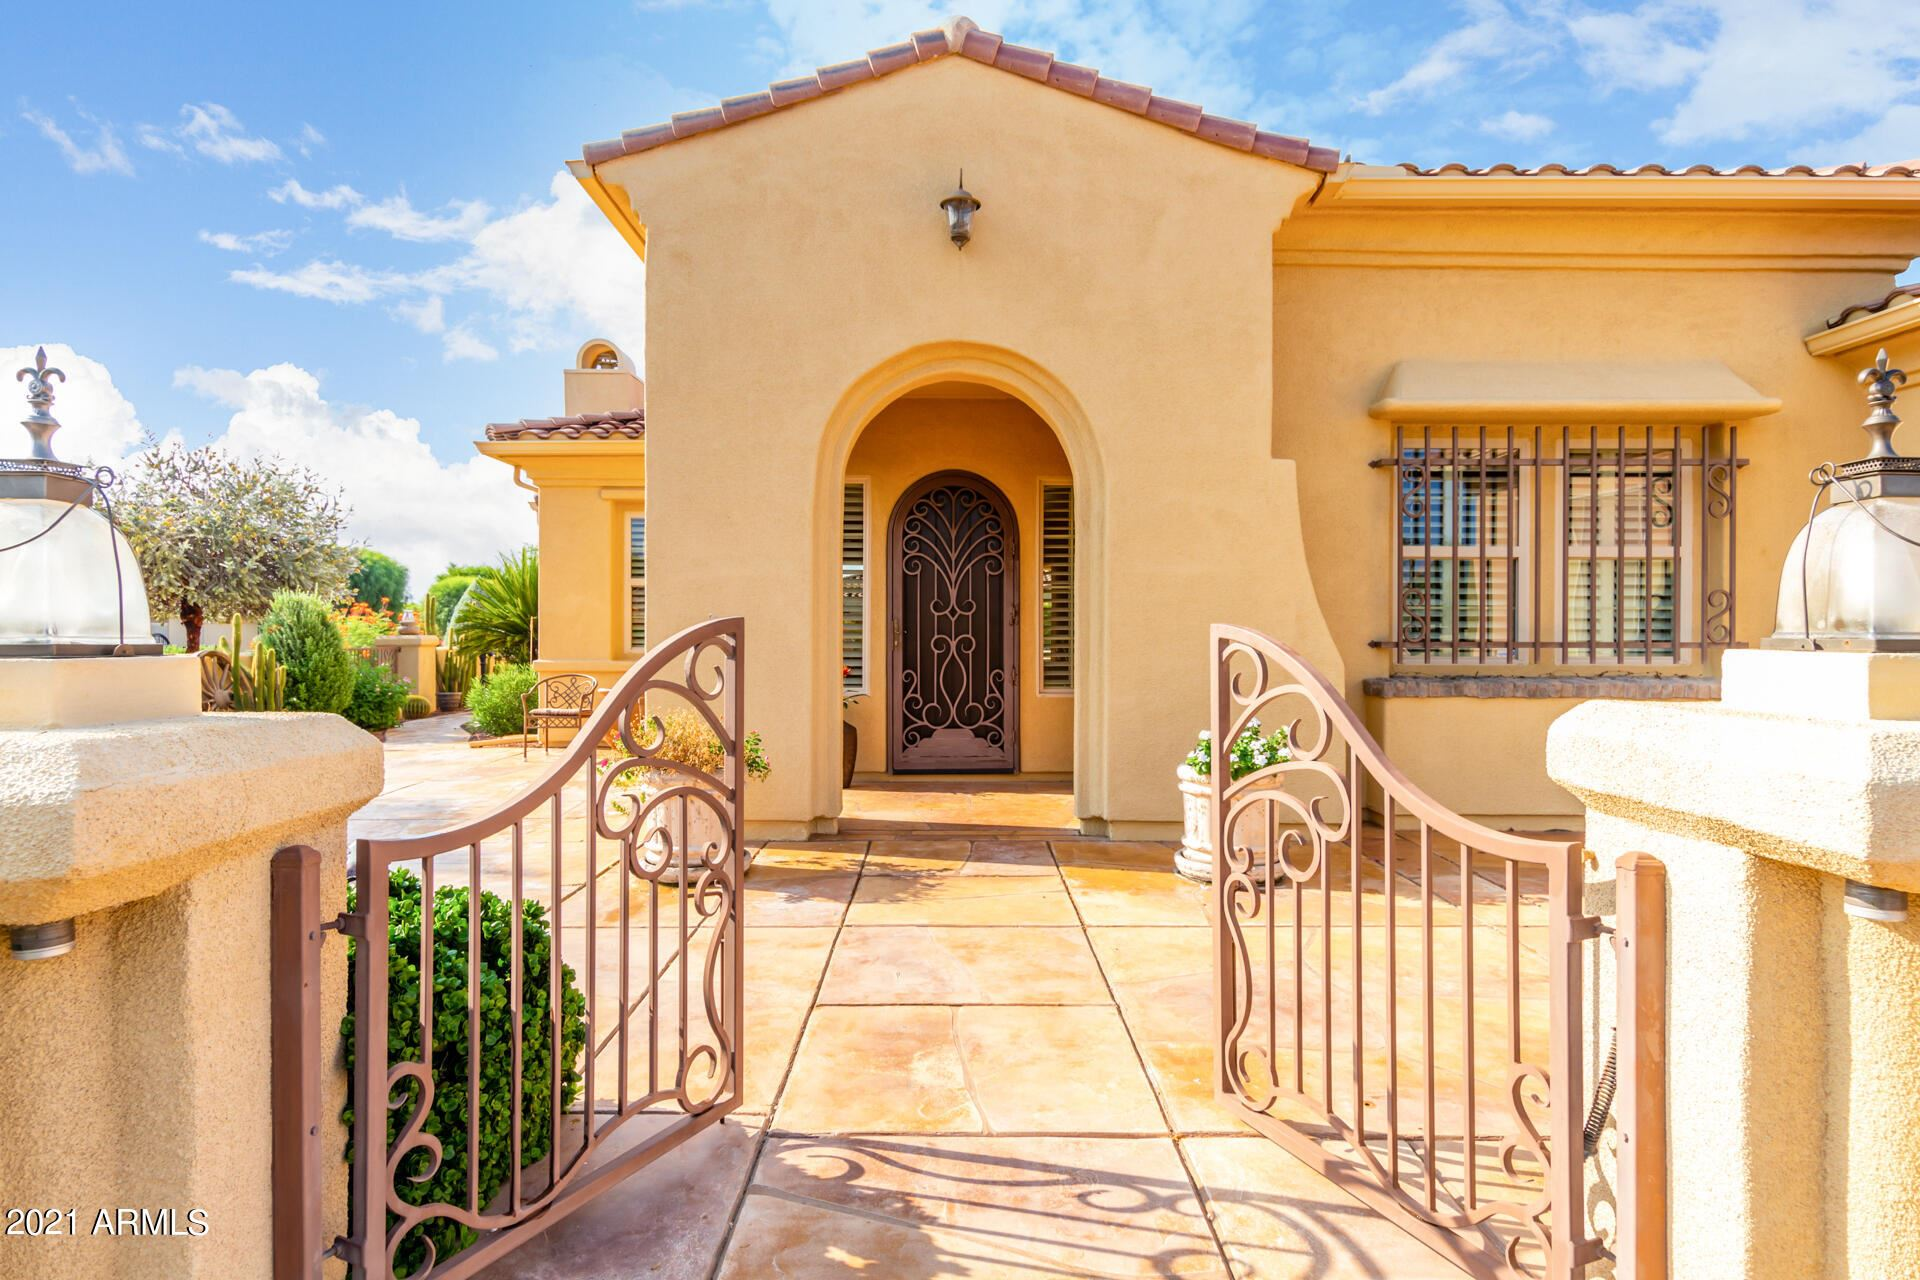 13203 W LOS BANCOS Drive, Sun City West, AZ 85375 - MLS#: 6288950